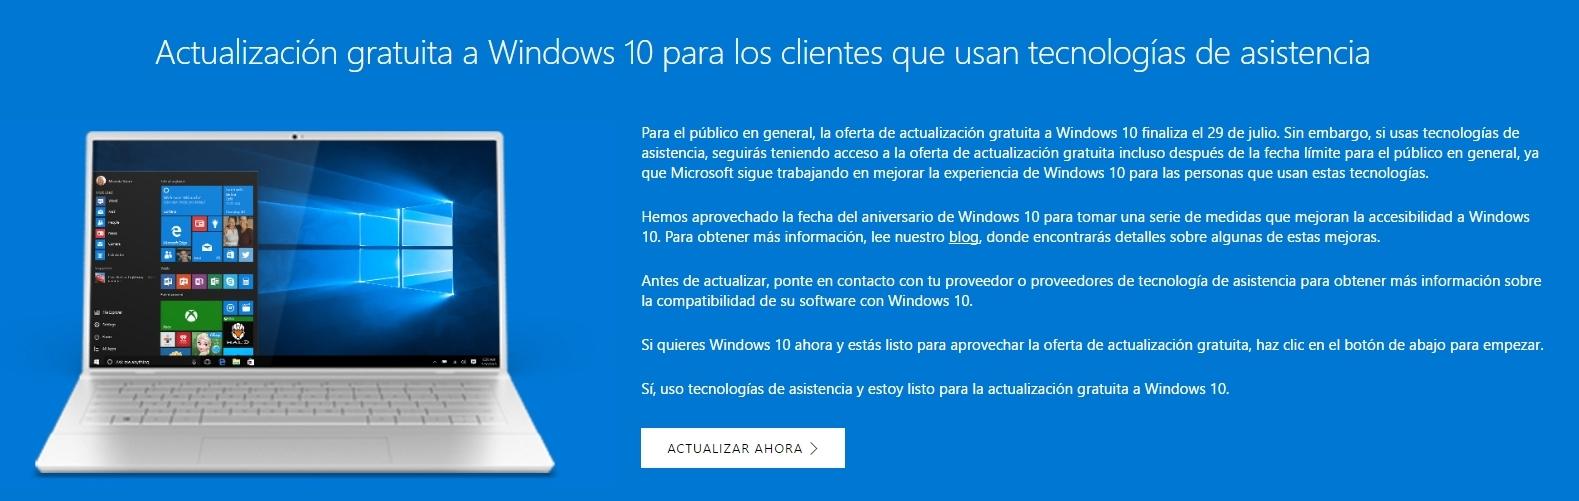 windows 10 actualizacion asistencia